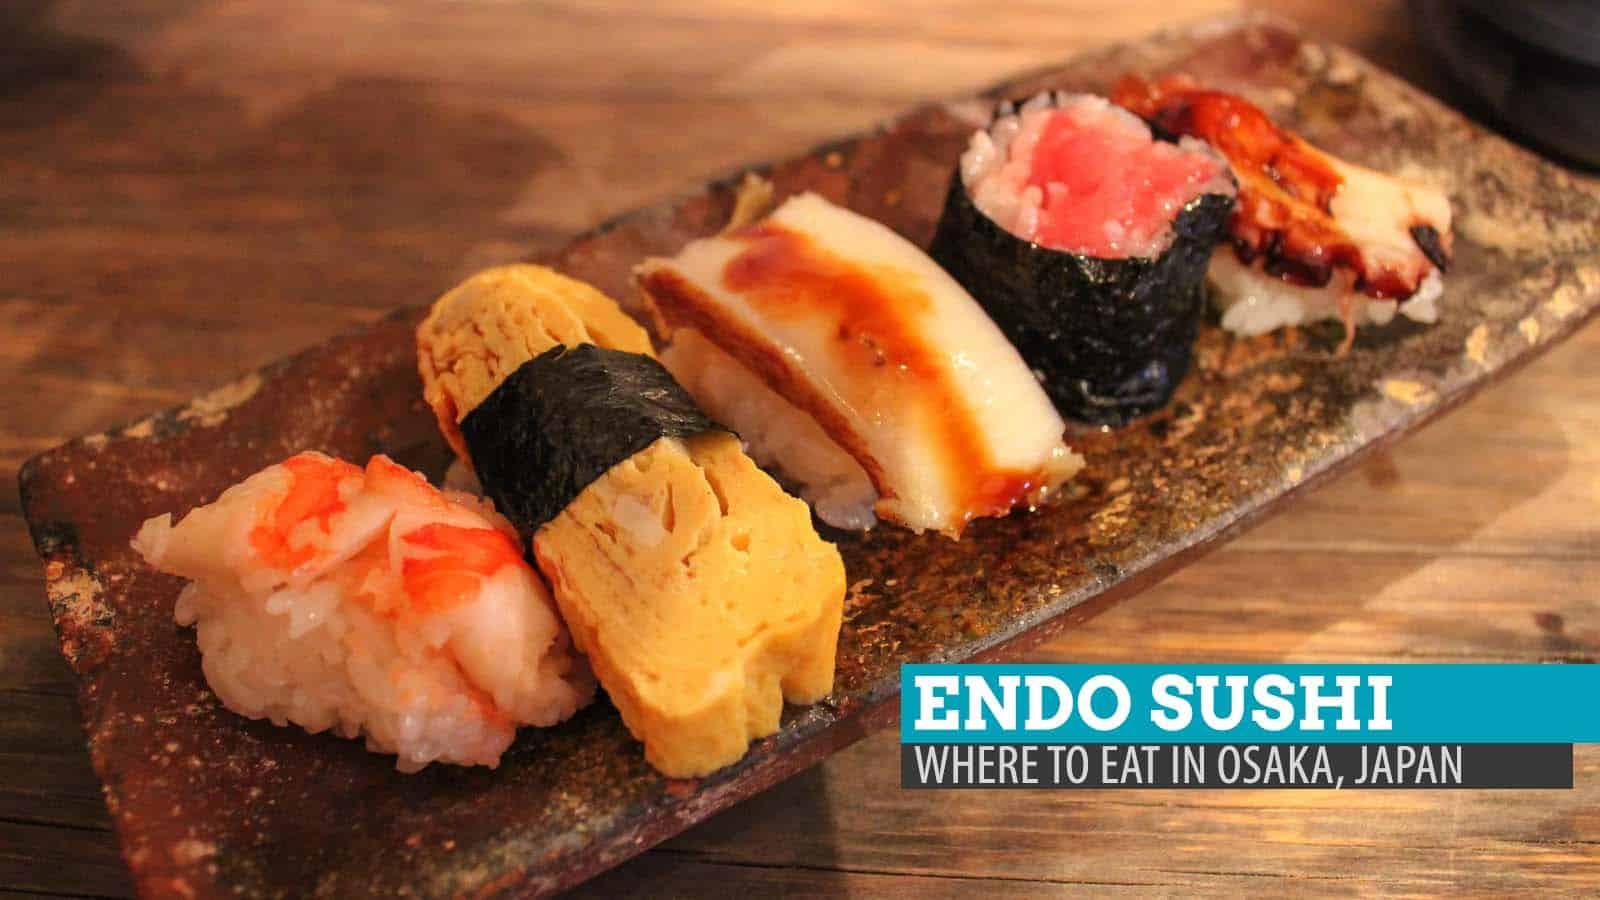 Endo Sushi: Where to Eat in Osaka, Japan